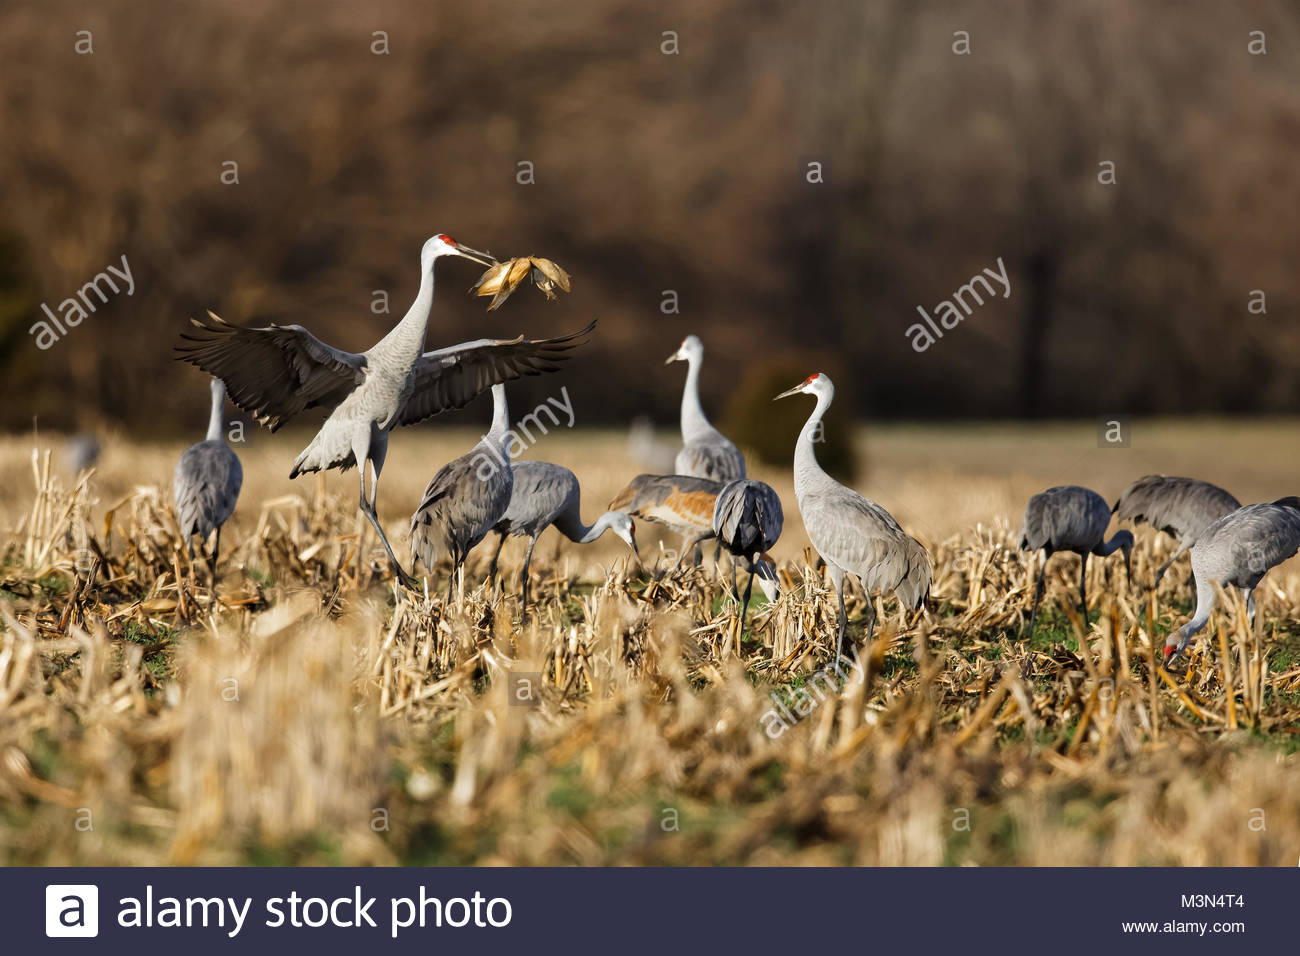 Sandhill Crane jumping and throwing corn shucks into air - Stock Image